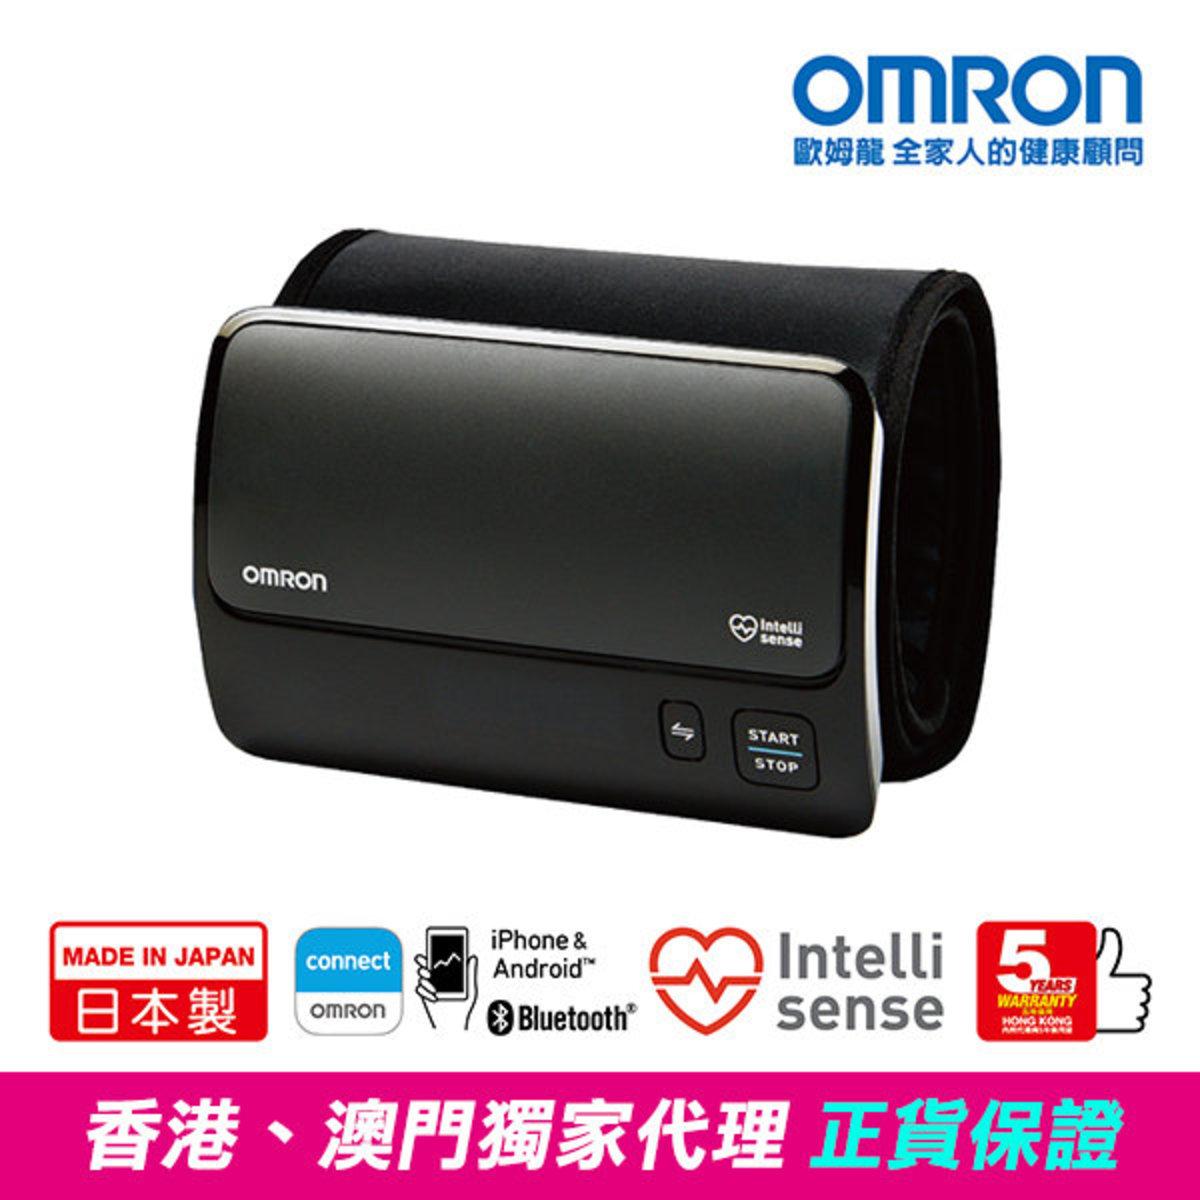 OMRON - HEM-7600T Arm Type Blood Pressure Monitor